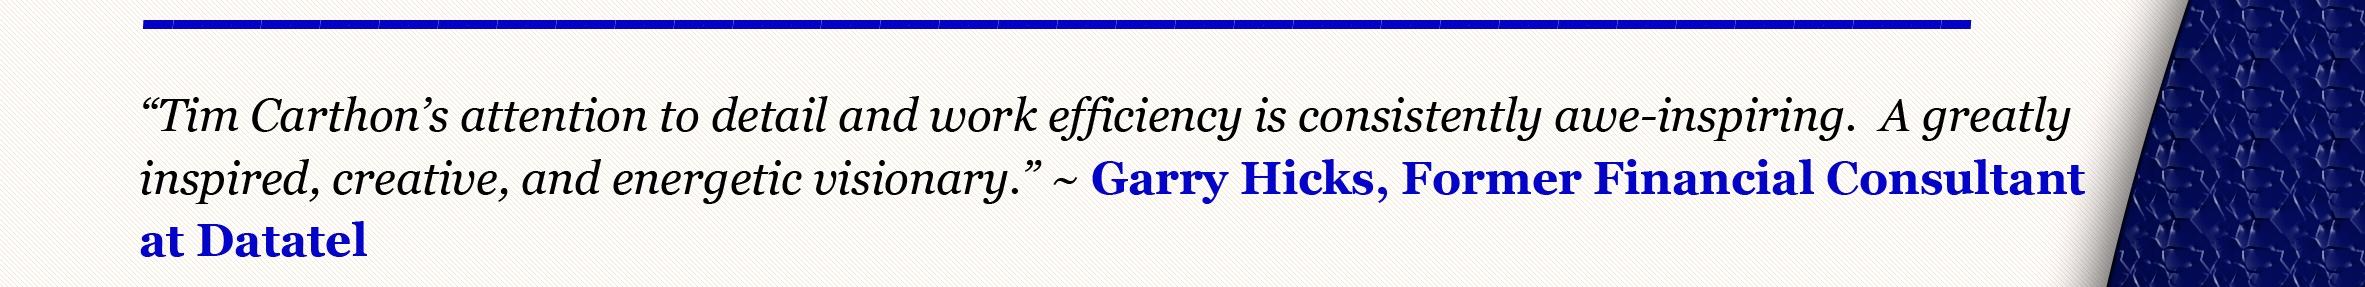 Garry Hick's Quote